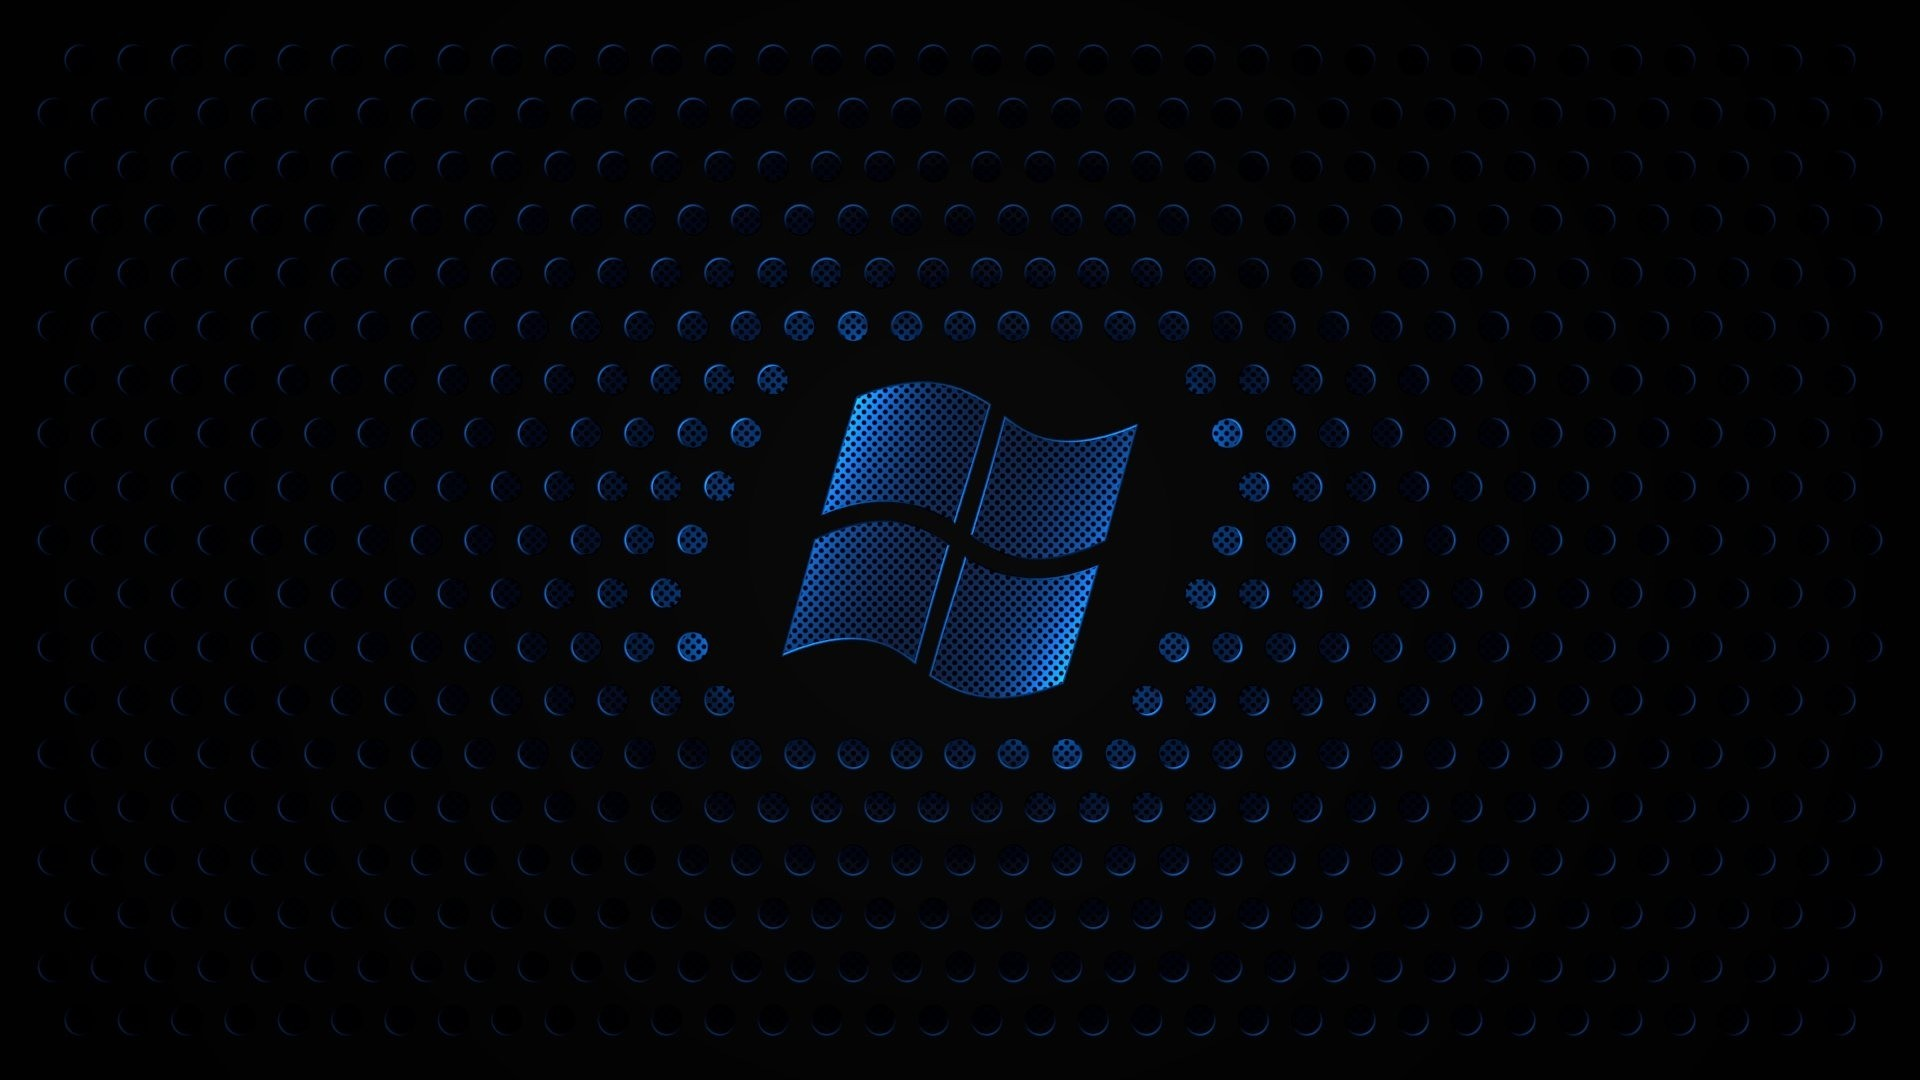 1920x1080 Black Background HD Wallpapers 1920 X 1200 Desktop Blue Hd